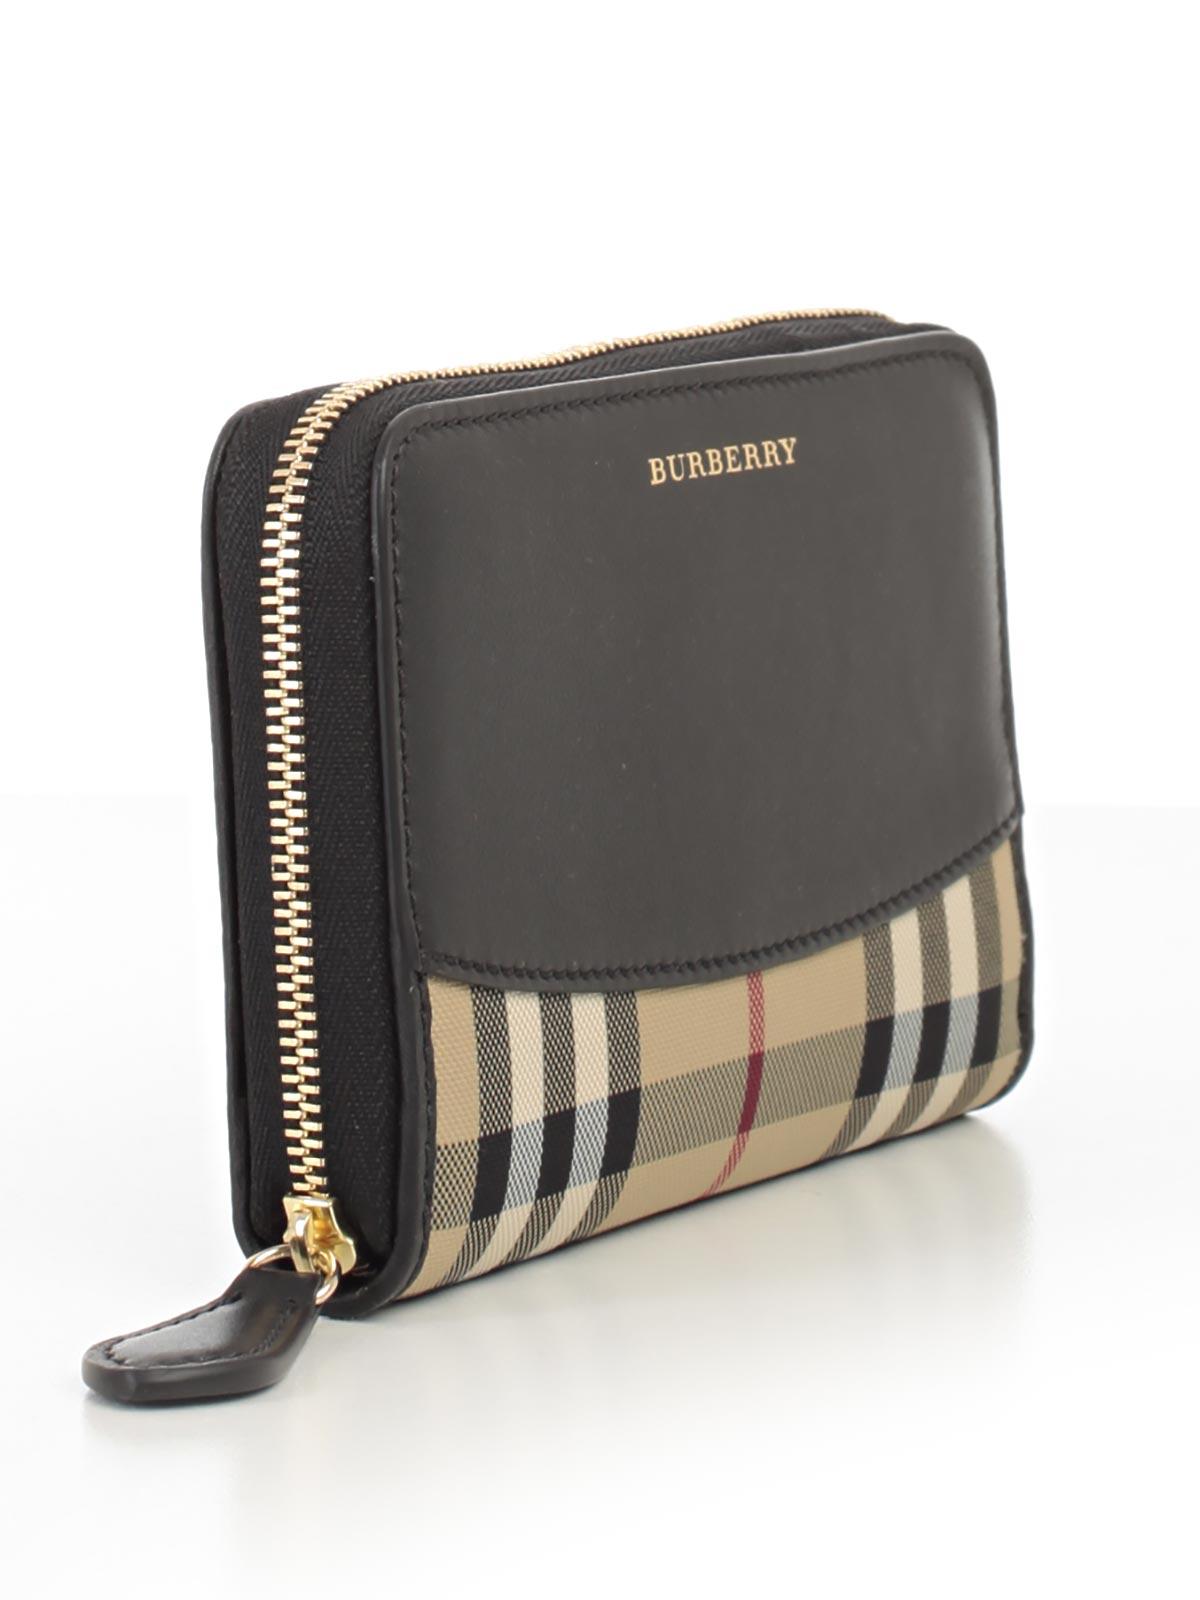 Bernardelli Store Burberry Wallet